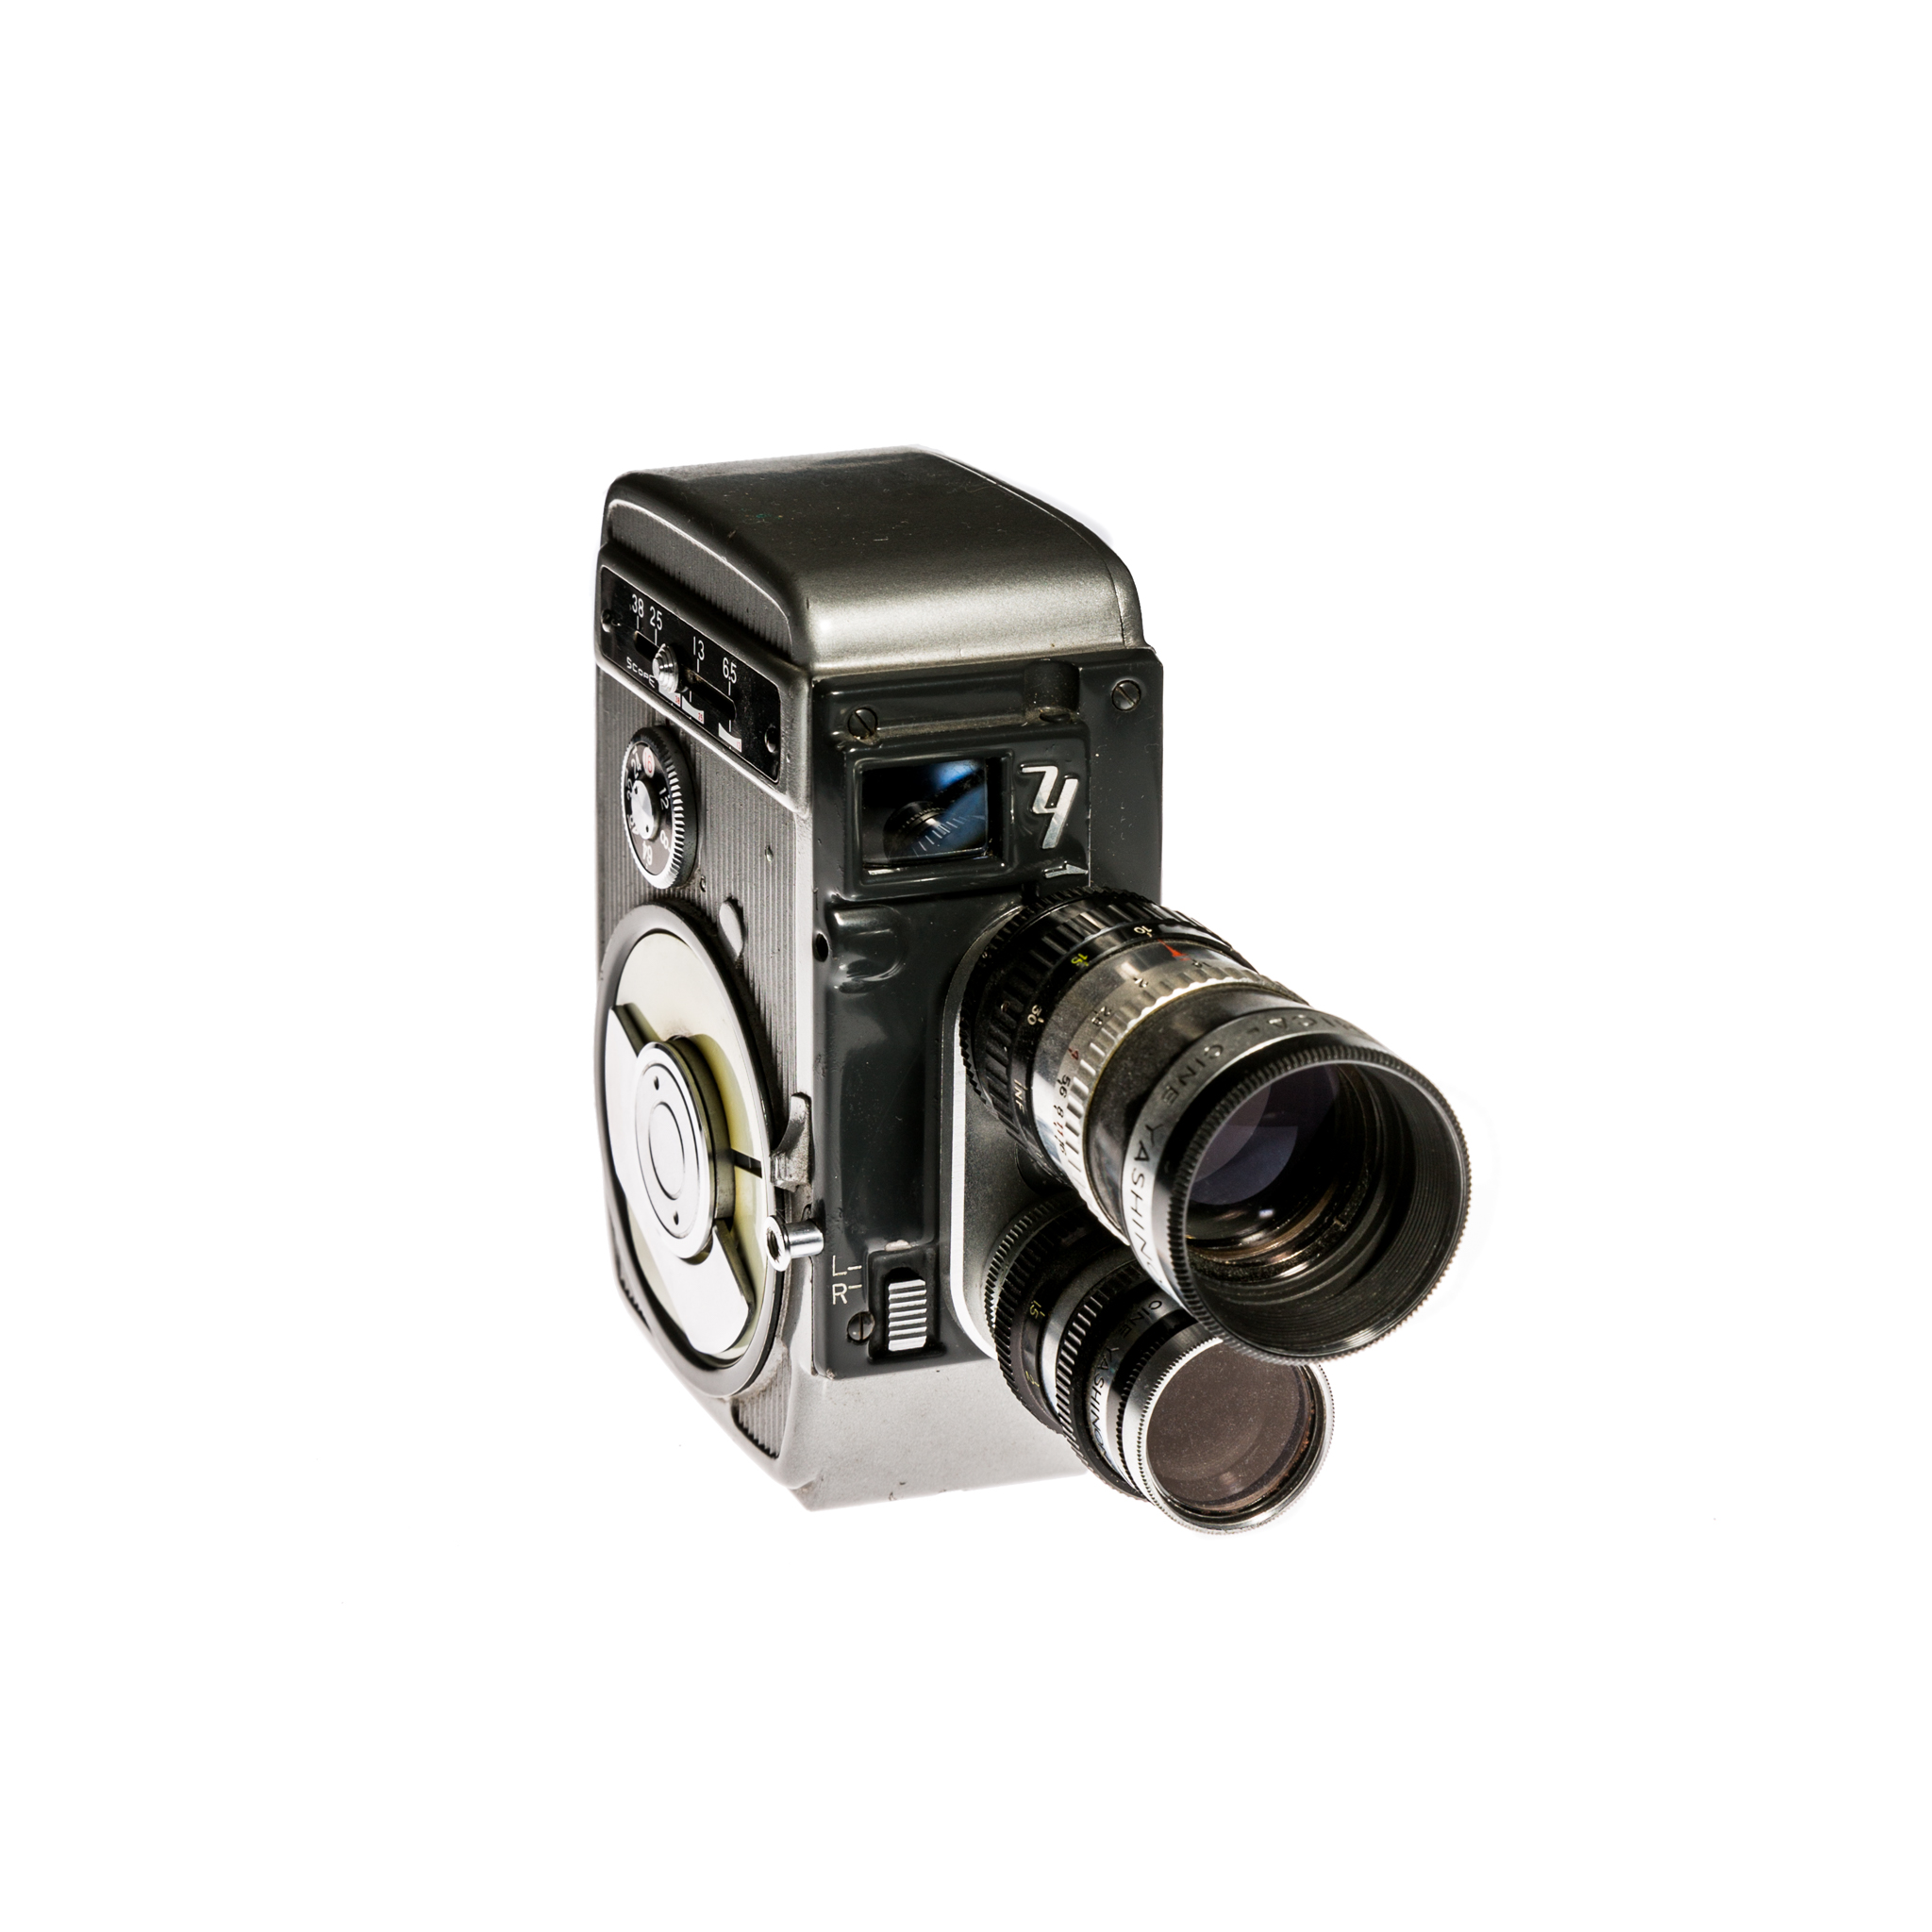 Yashica 8 8mm Movie Camera (1961)